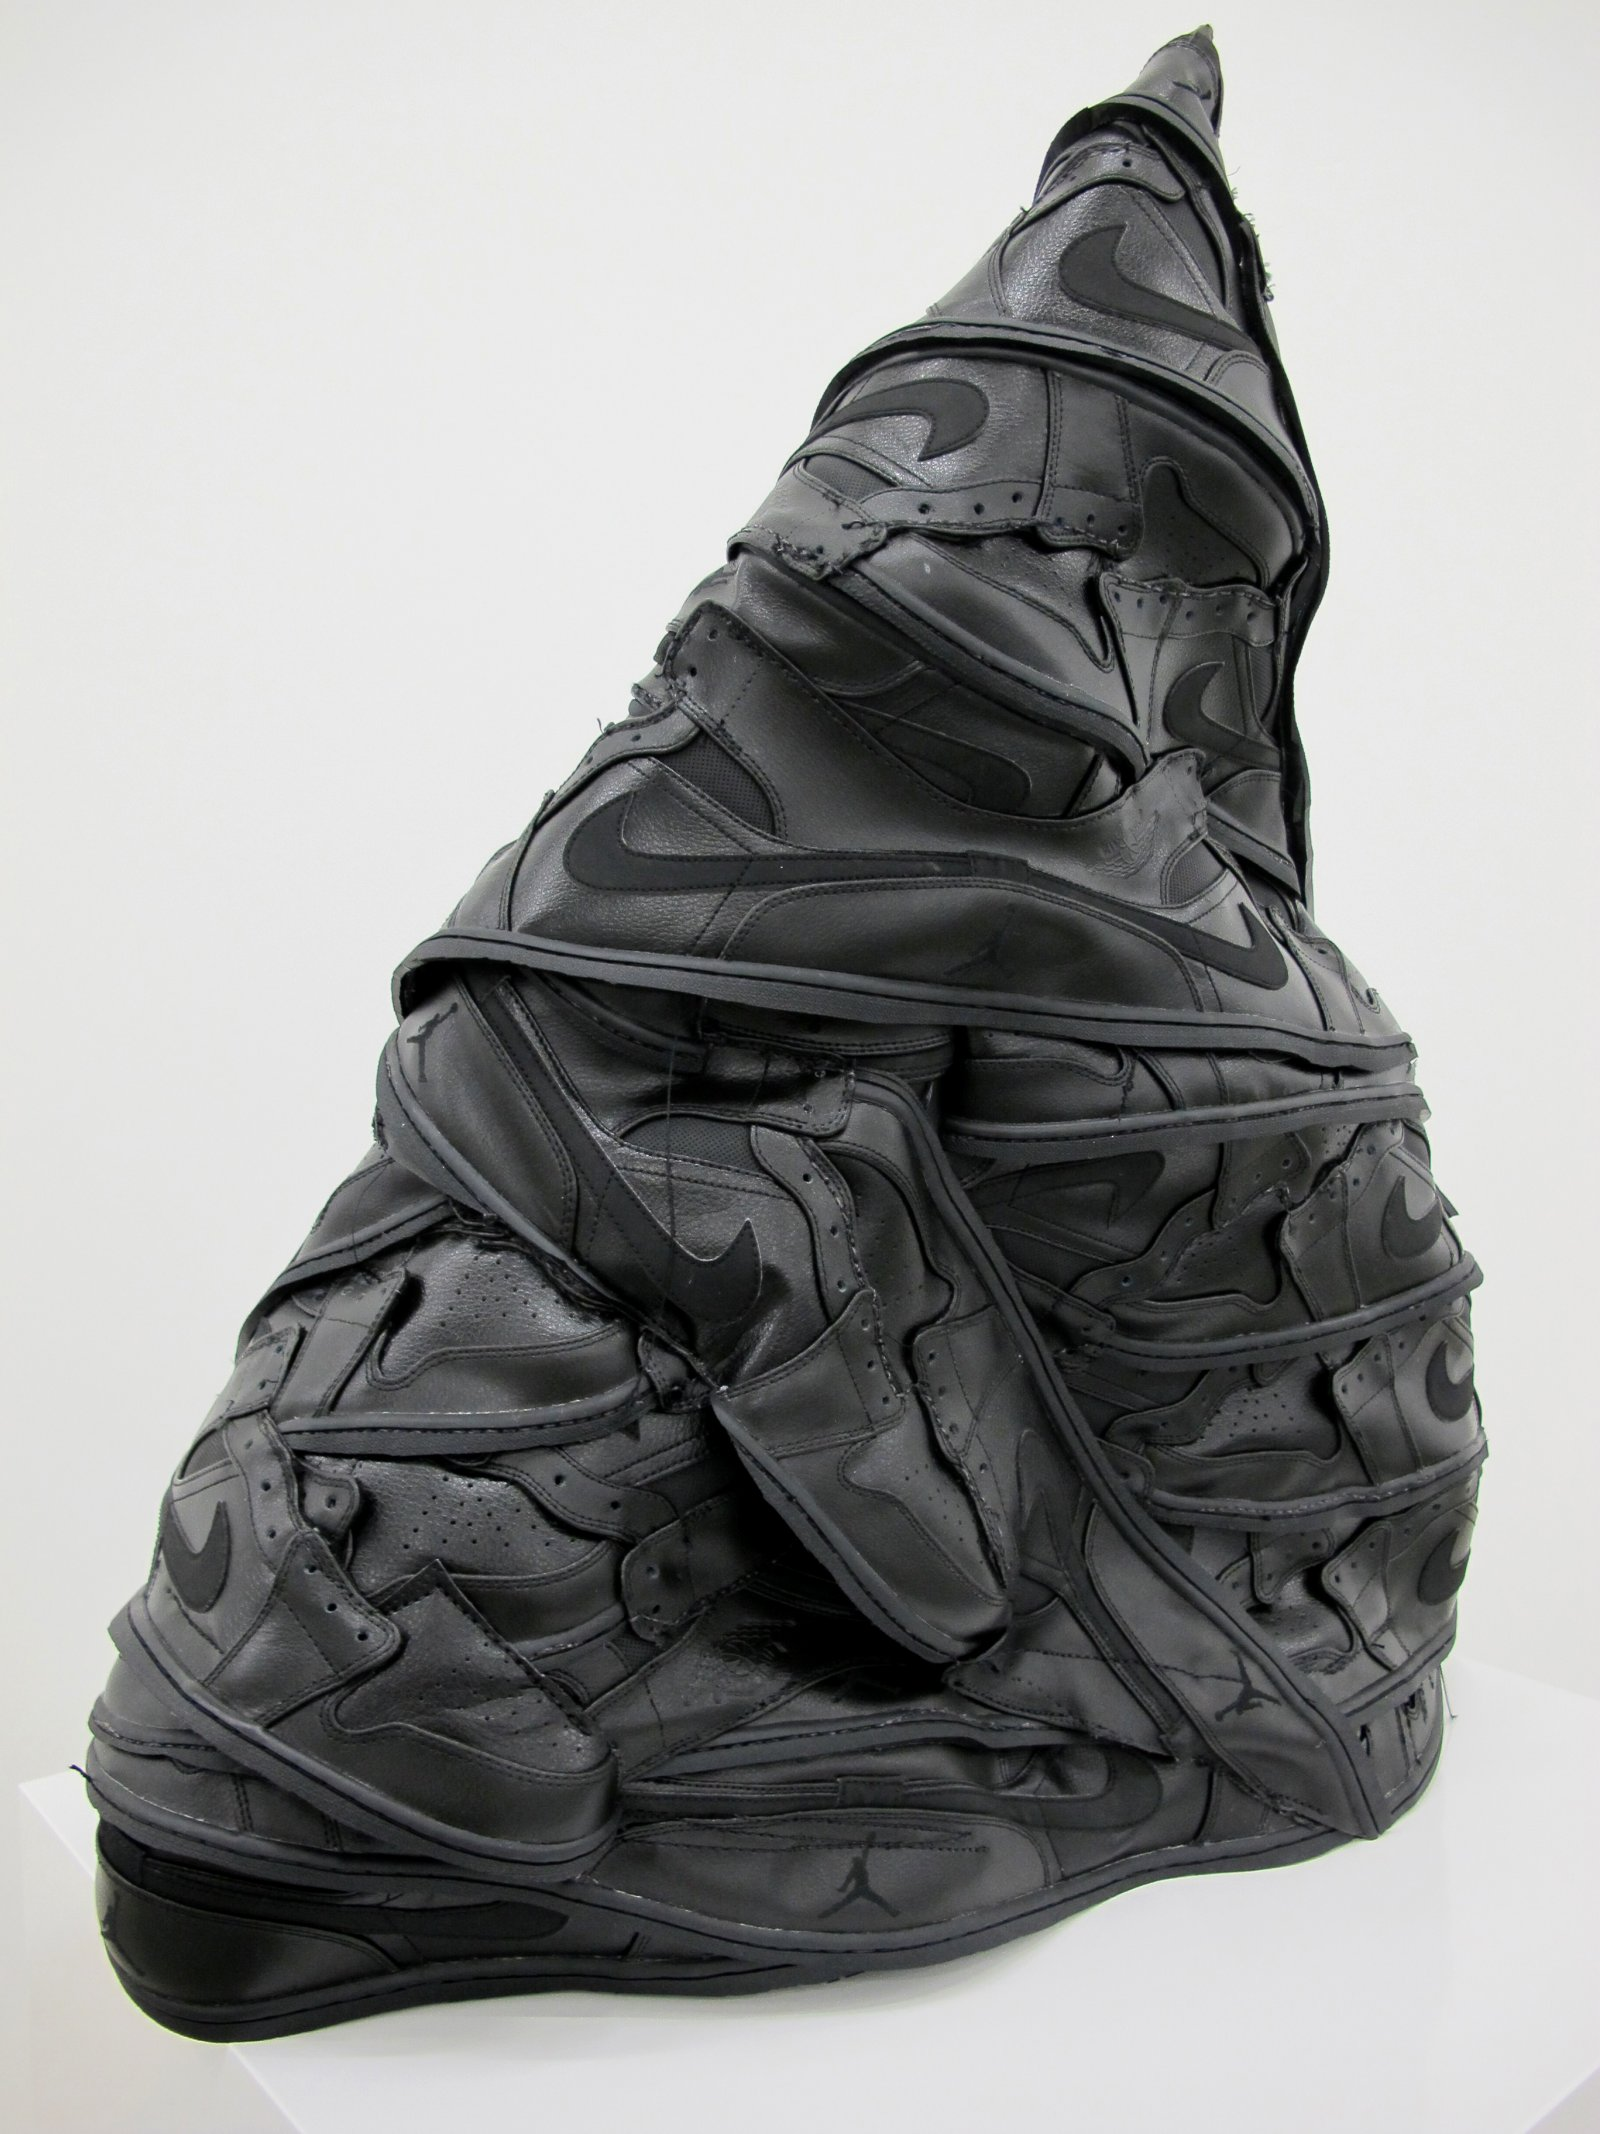 Brian Jungen,I ShallBe Released, 2015, nike air jordan shoes (black, #1), 29 x 26 x 12 in. (74 x 66 x 31 cm)